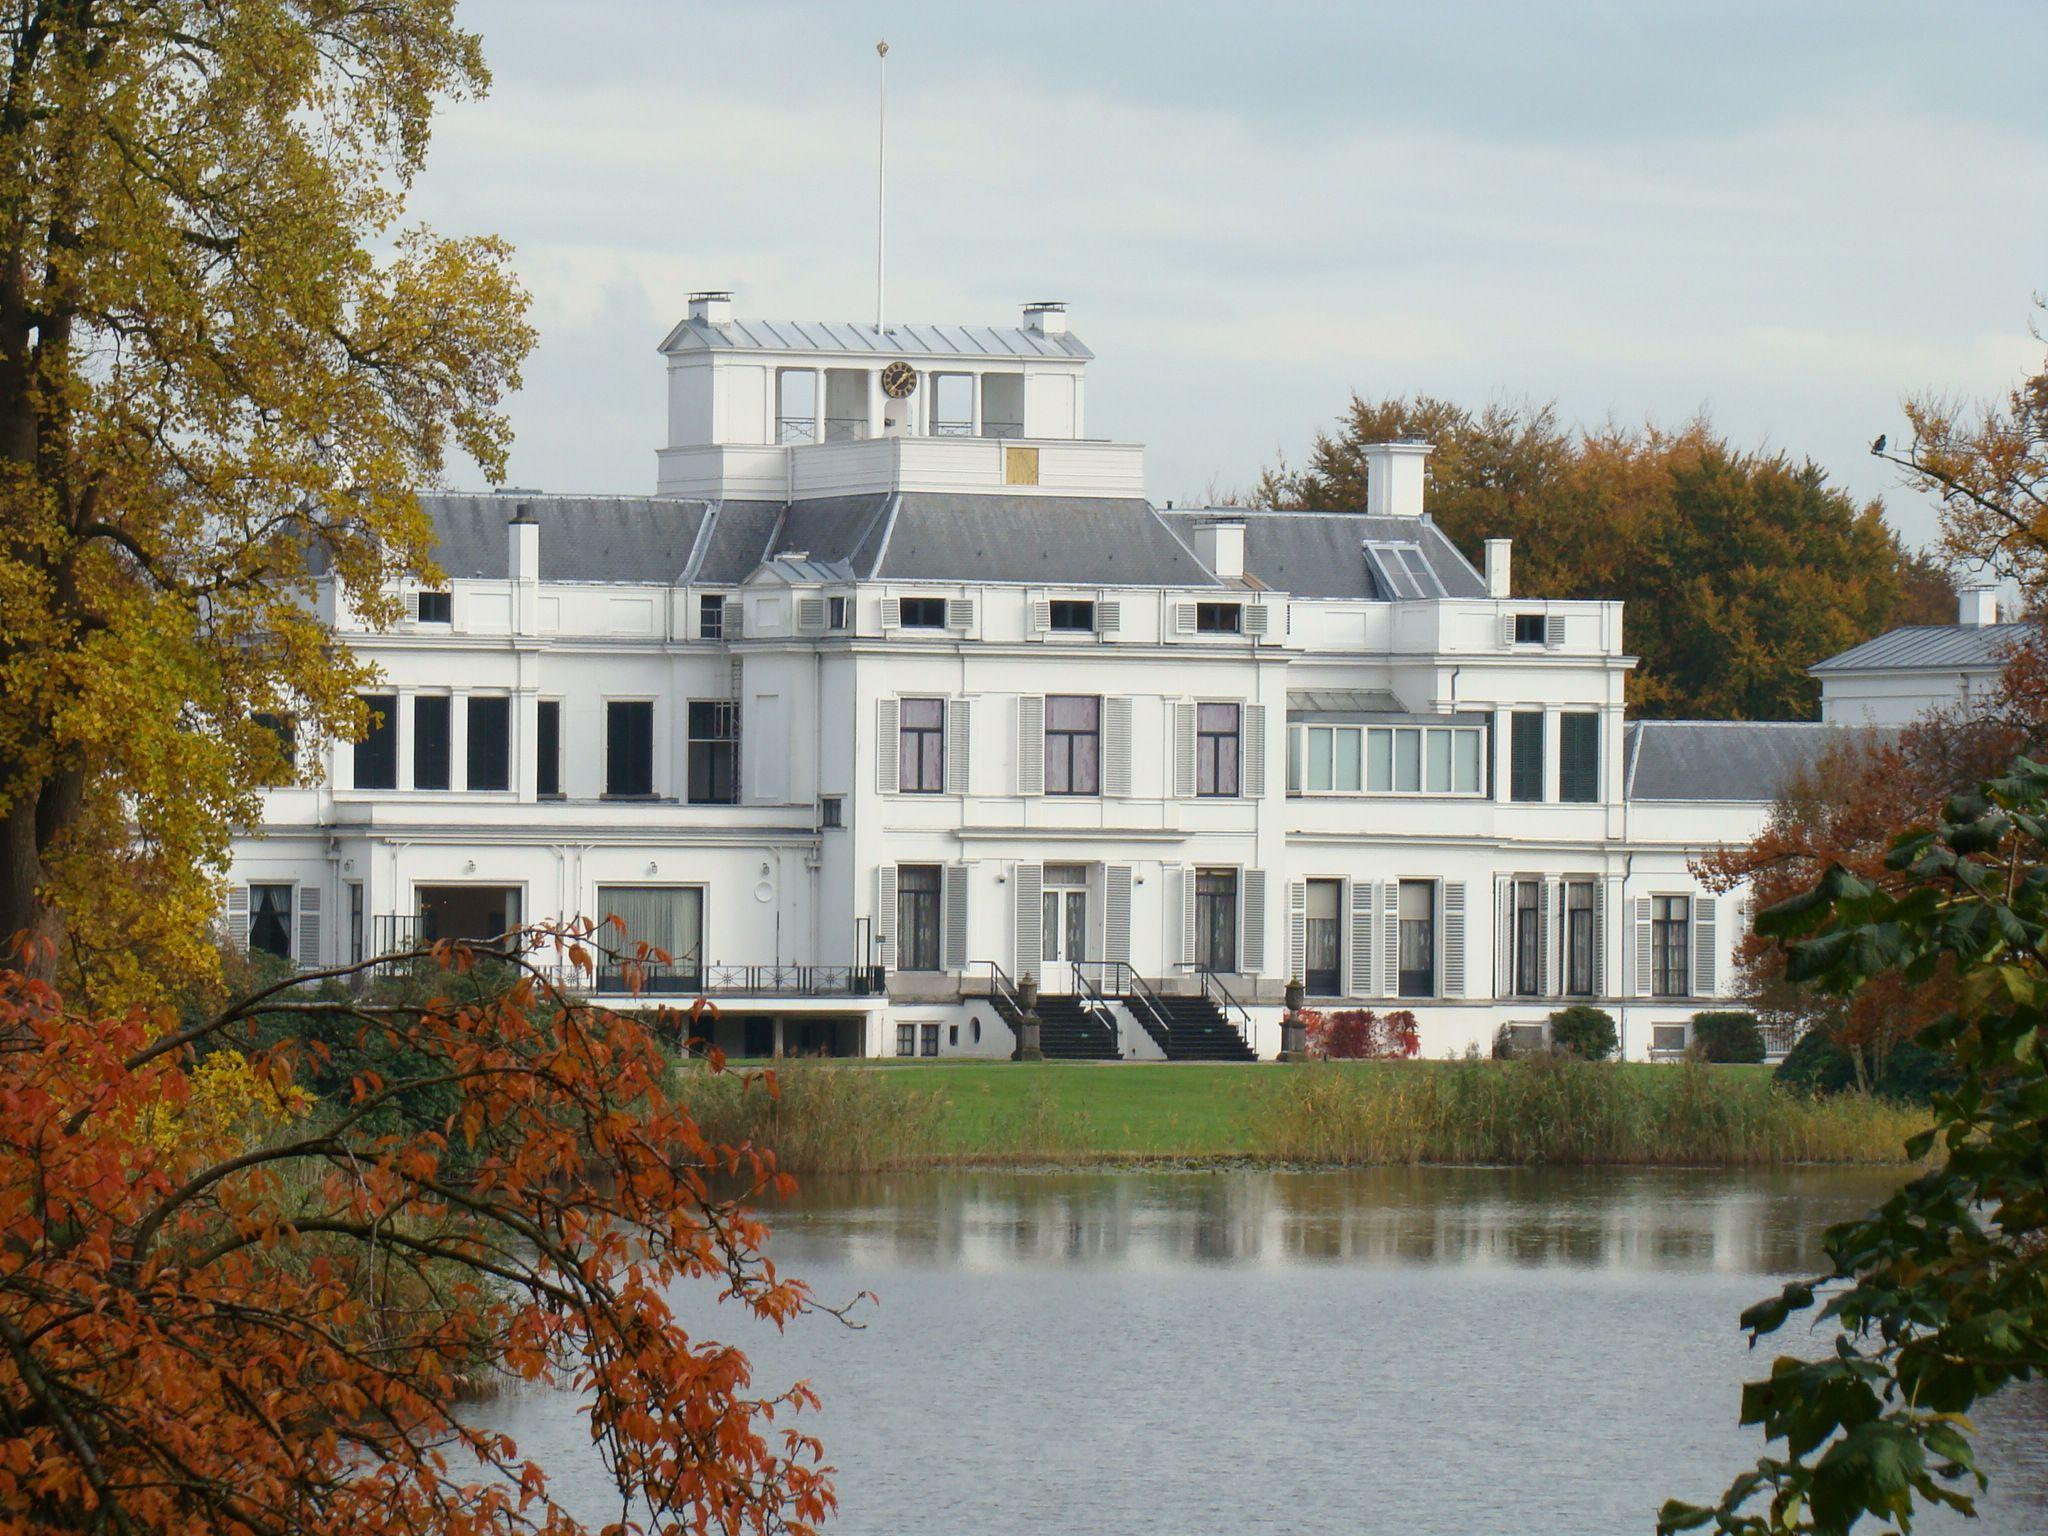 Tuin Paleis Soestdijk : Tuin paleis soestdijk castles & palaces pinterest palace